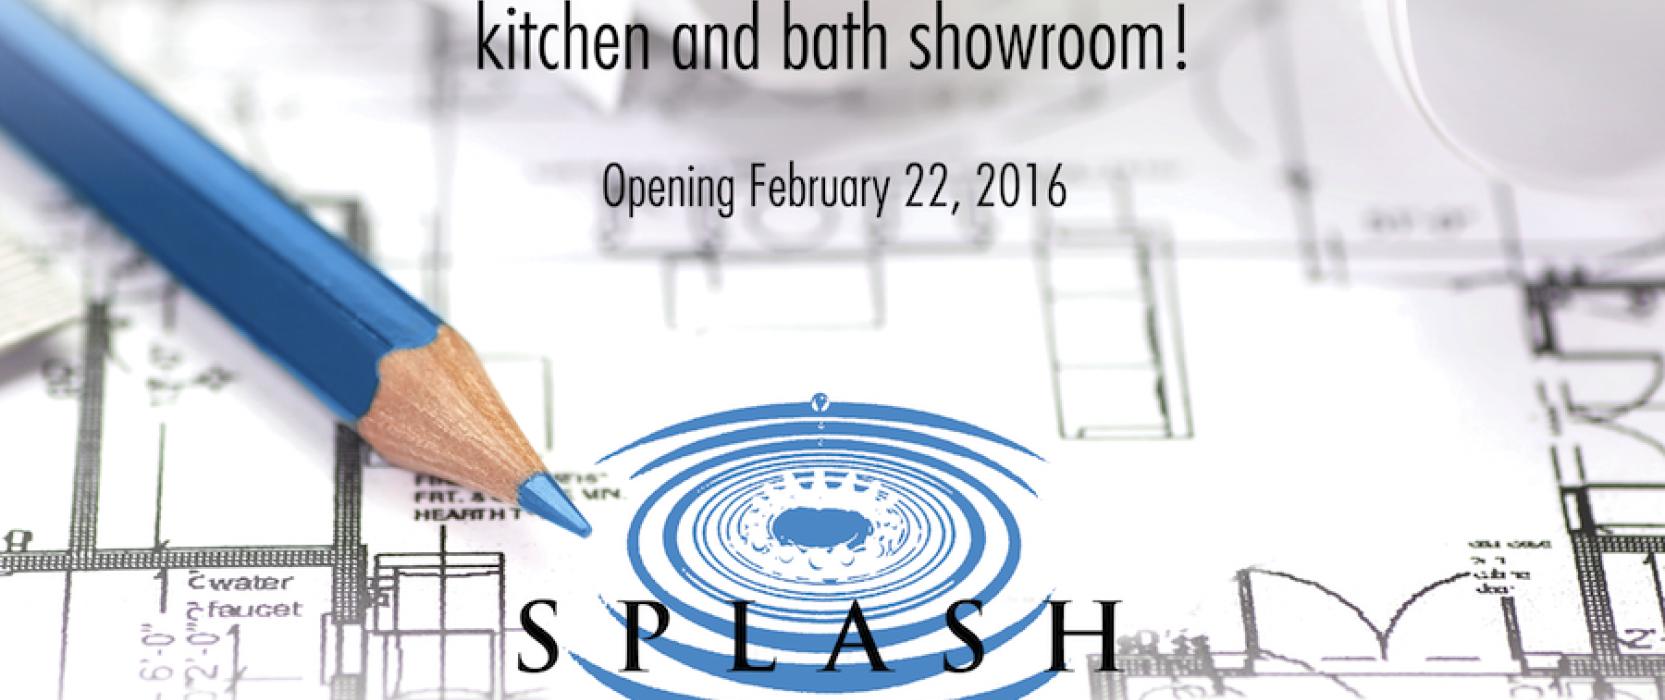 Renovation Celebration at Splash in Newton, MA